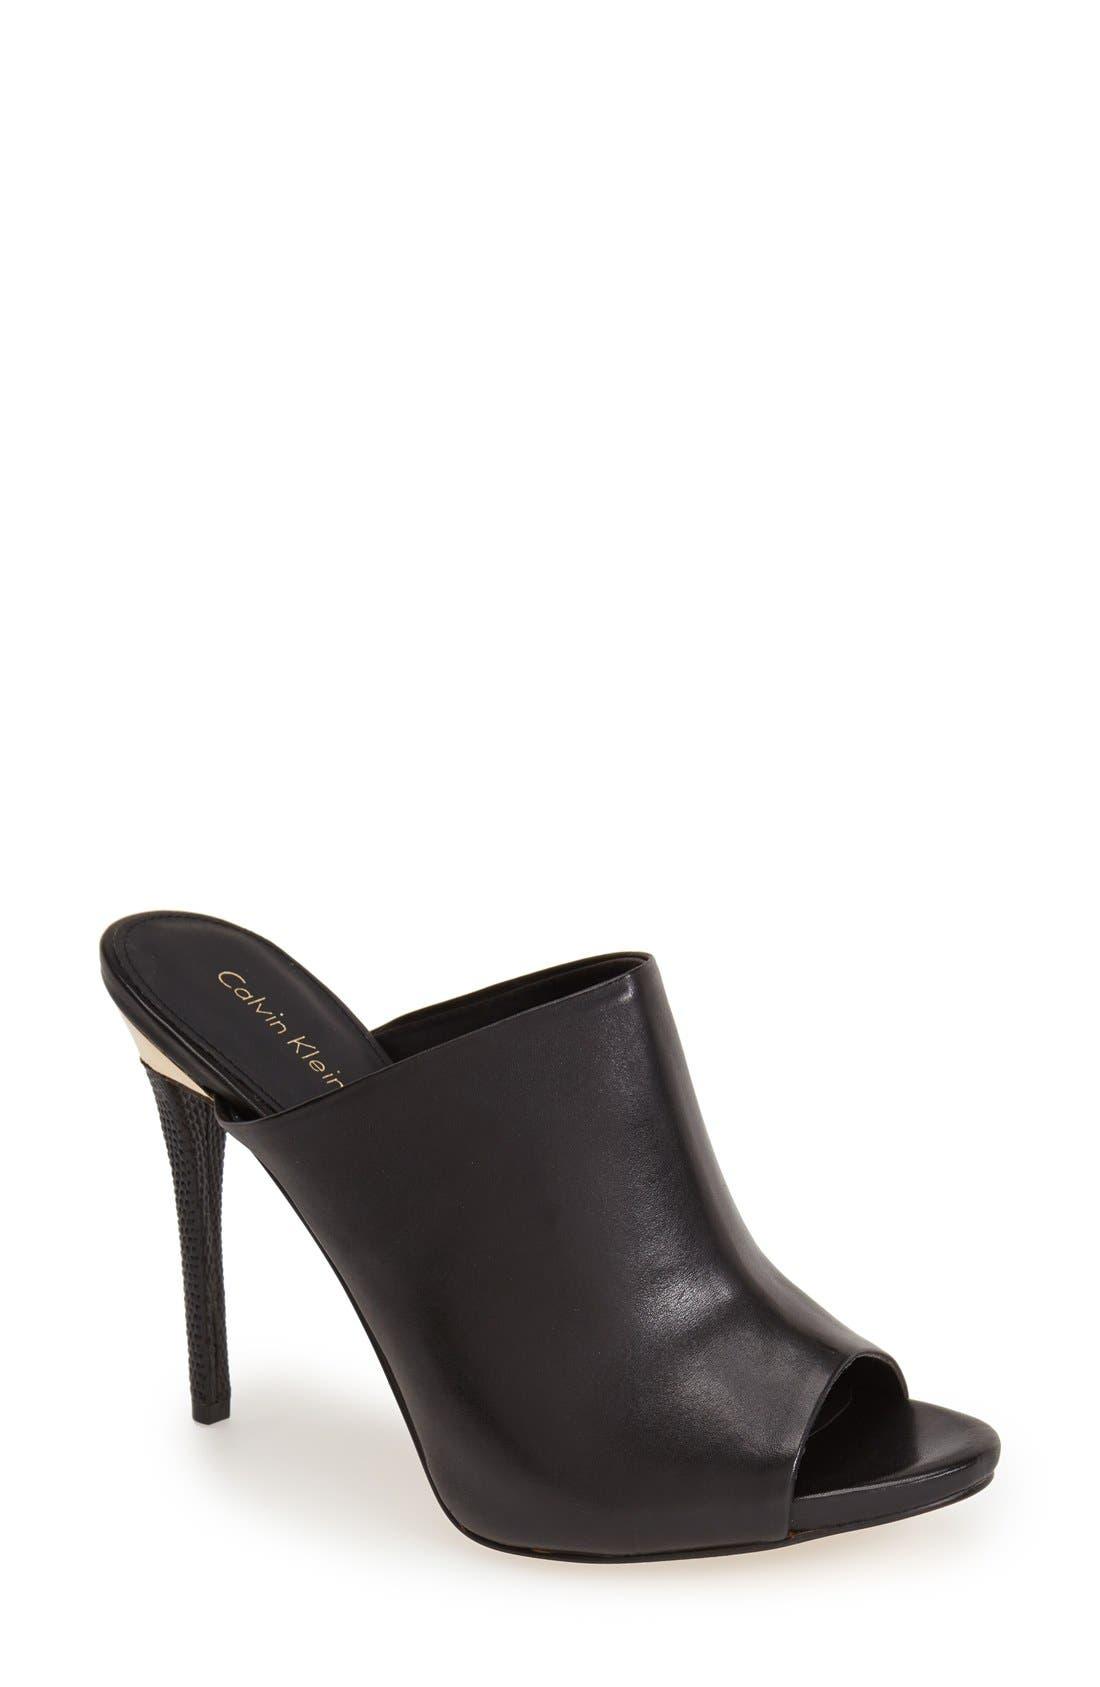 CALVIN KLEIN 'Gradyn' Peep Toe Mule Sandal, Main, color, 001